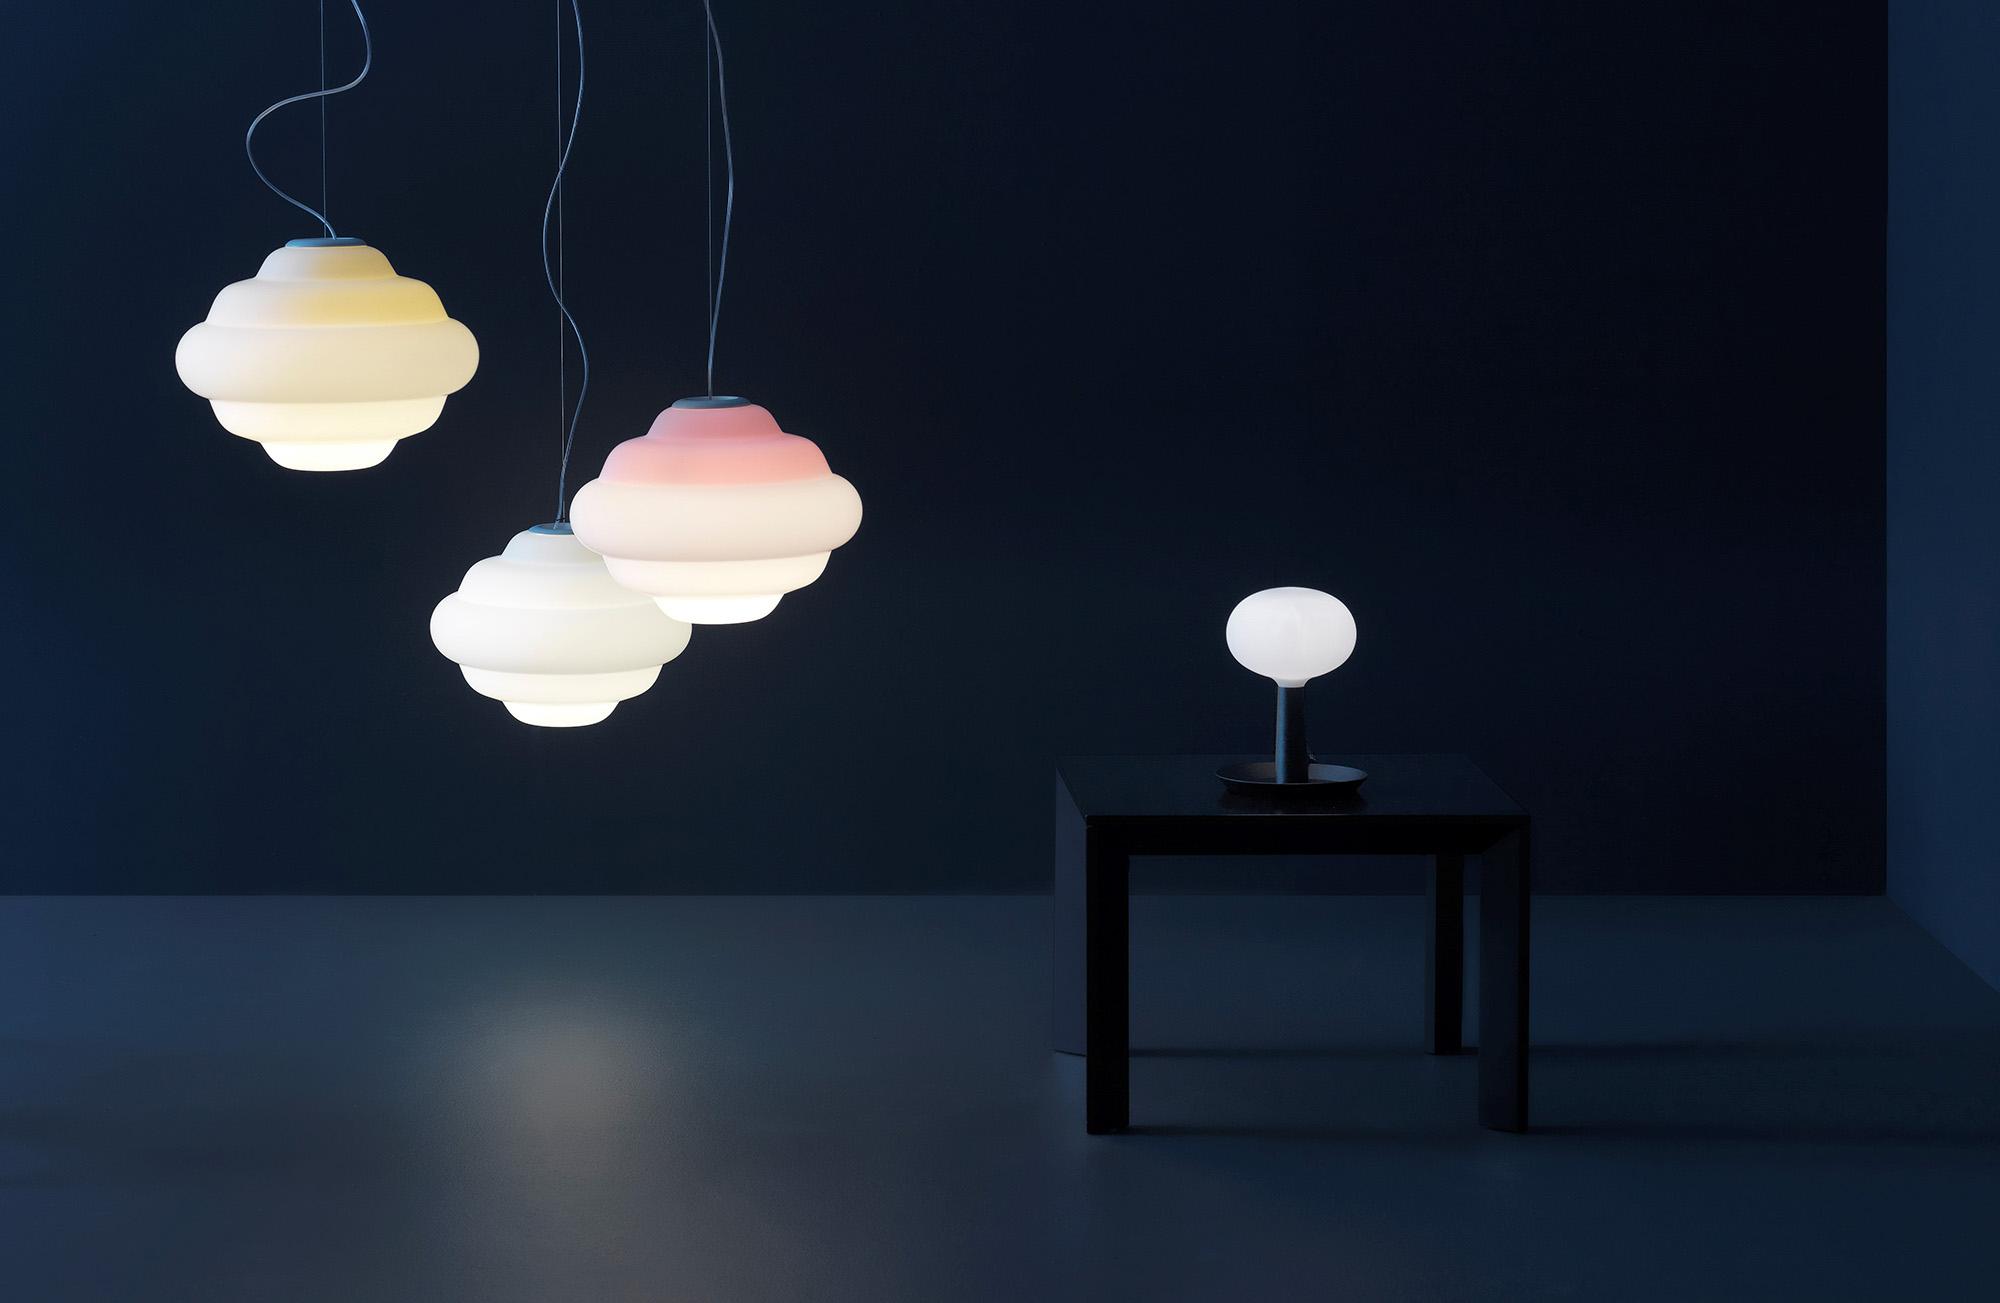 cloudtray_2000x1303